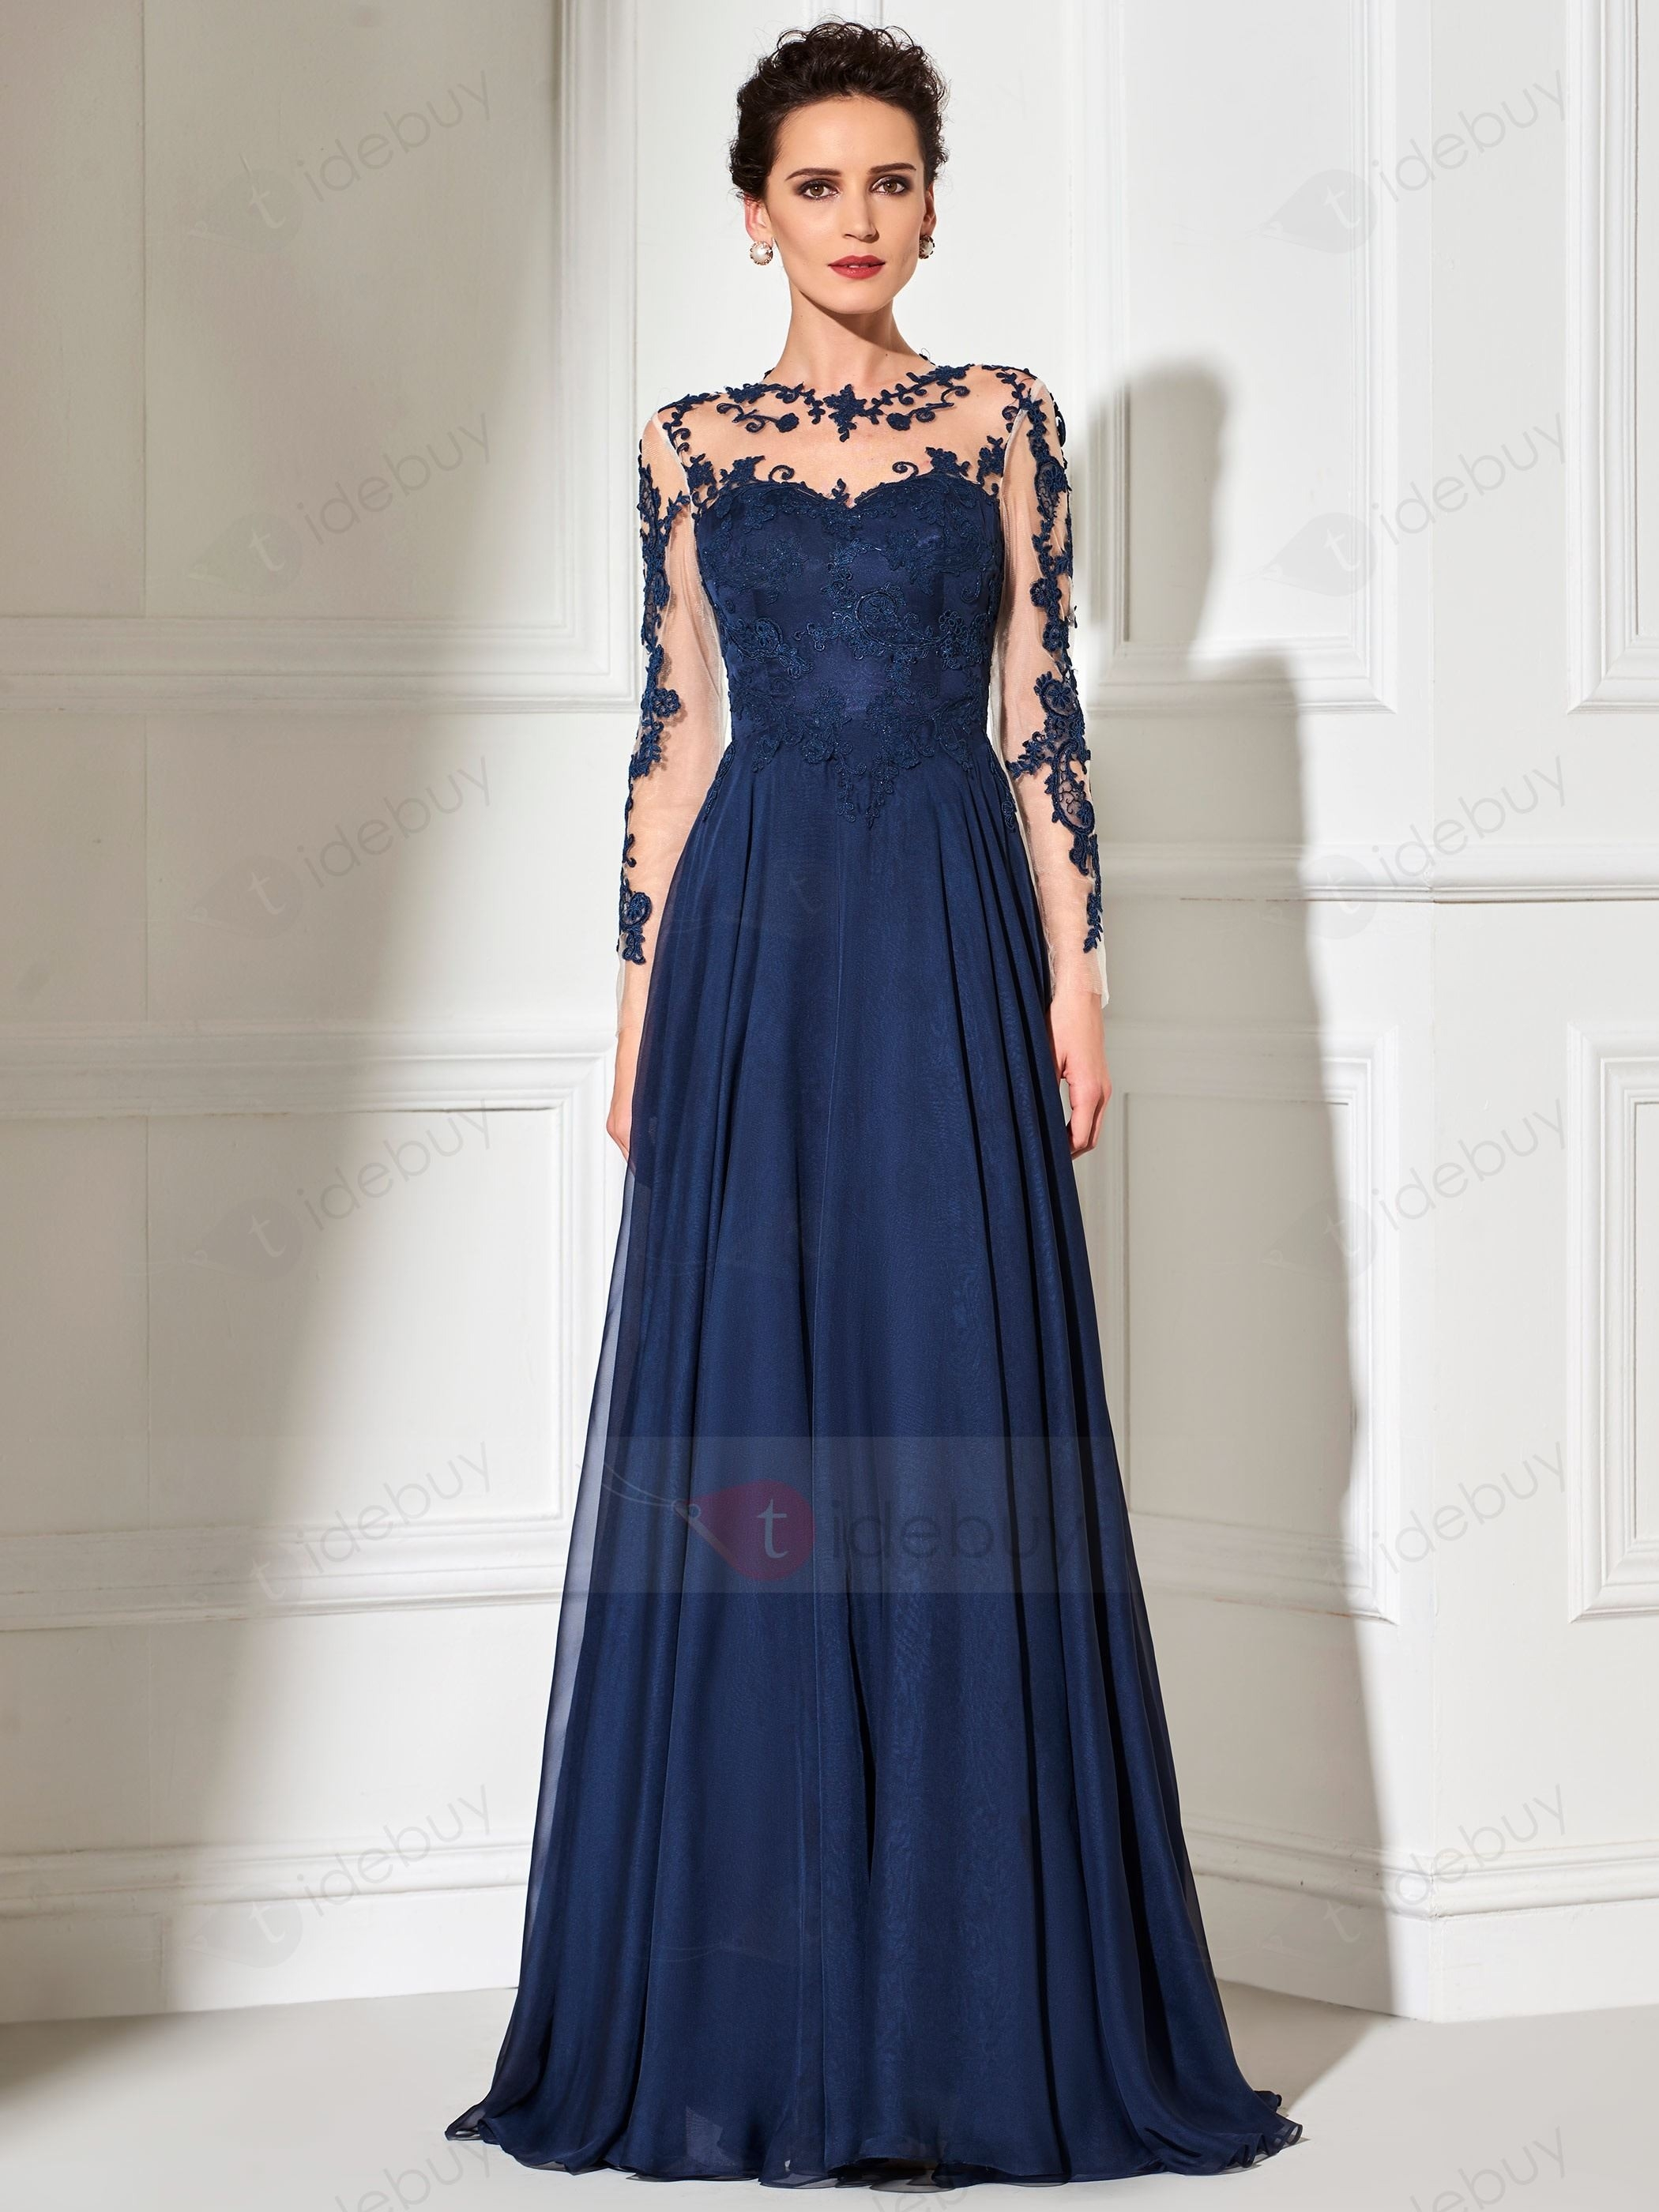 Formal Coolste Abendkleid Lang Schwarz Spitze Stylish17 Genial Abendkleid Lang Schwarz Spitze Spezialgebiet